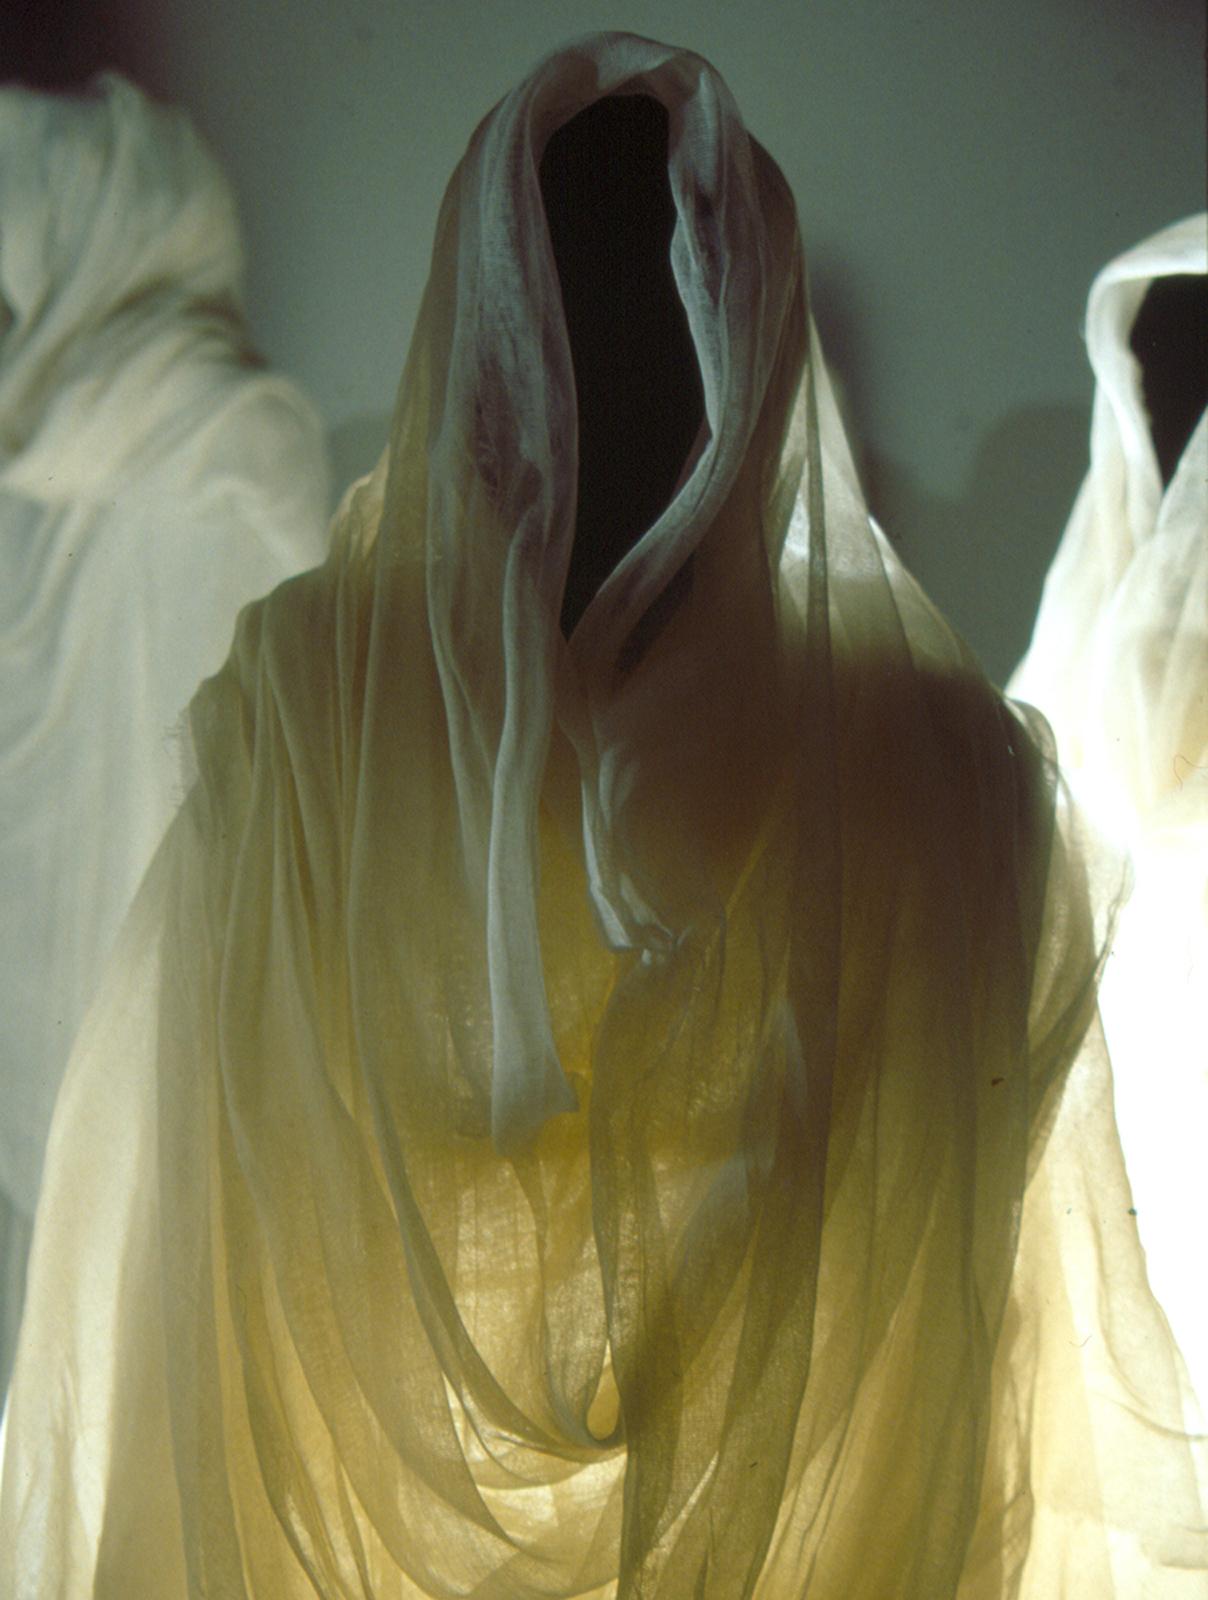 Shadows of Truth, 2001